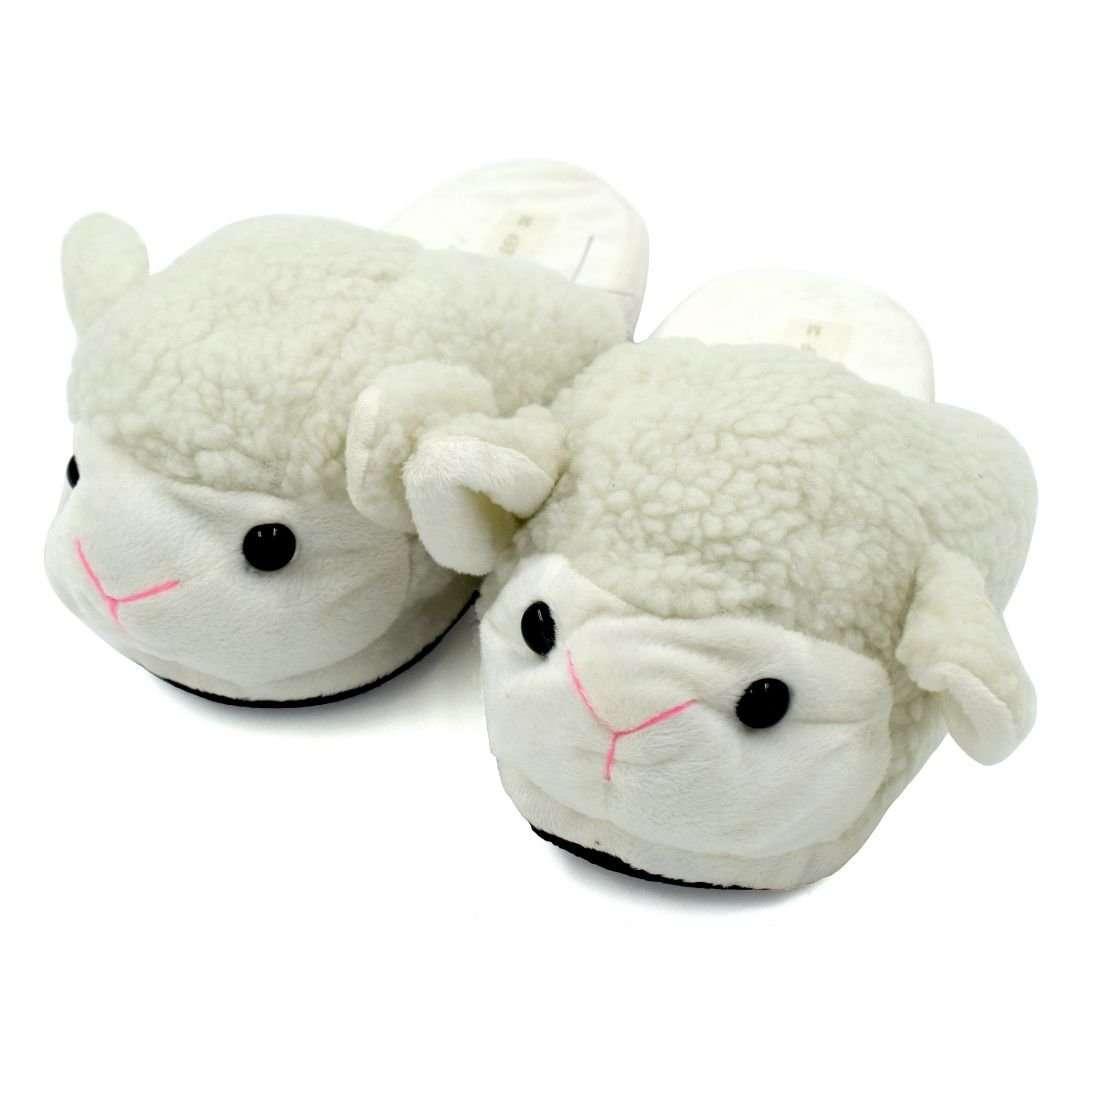 Sheep Slippers - Bulk Deal